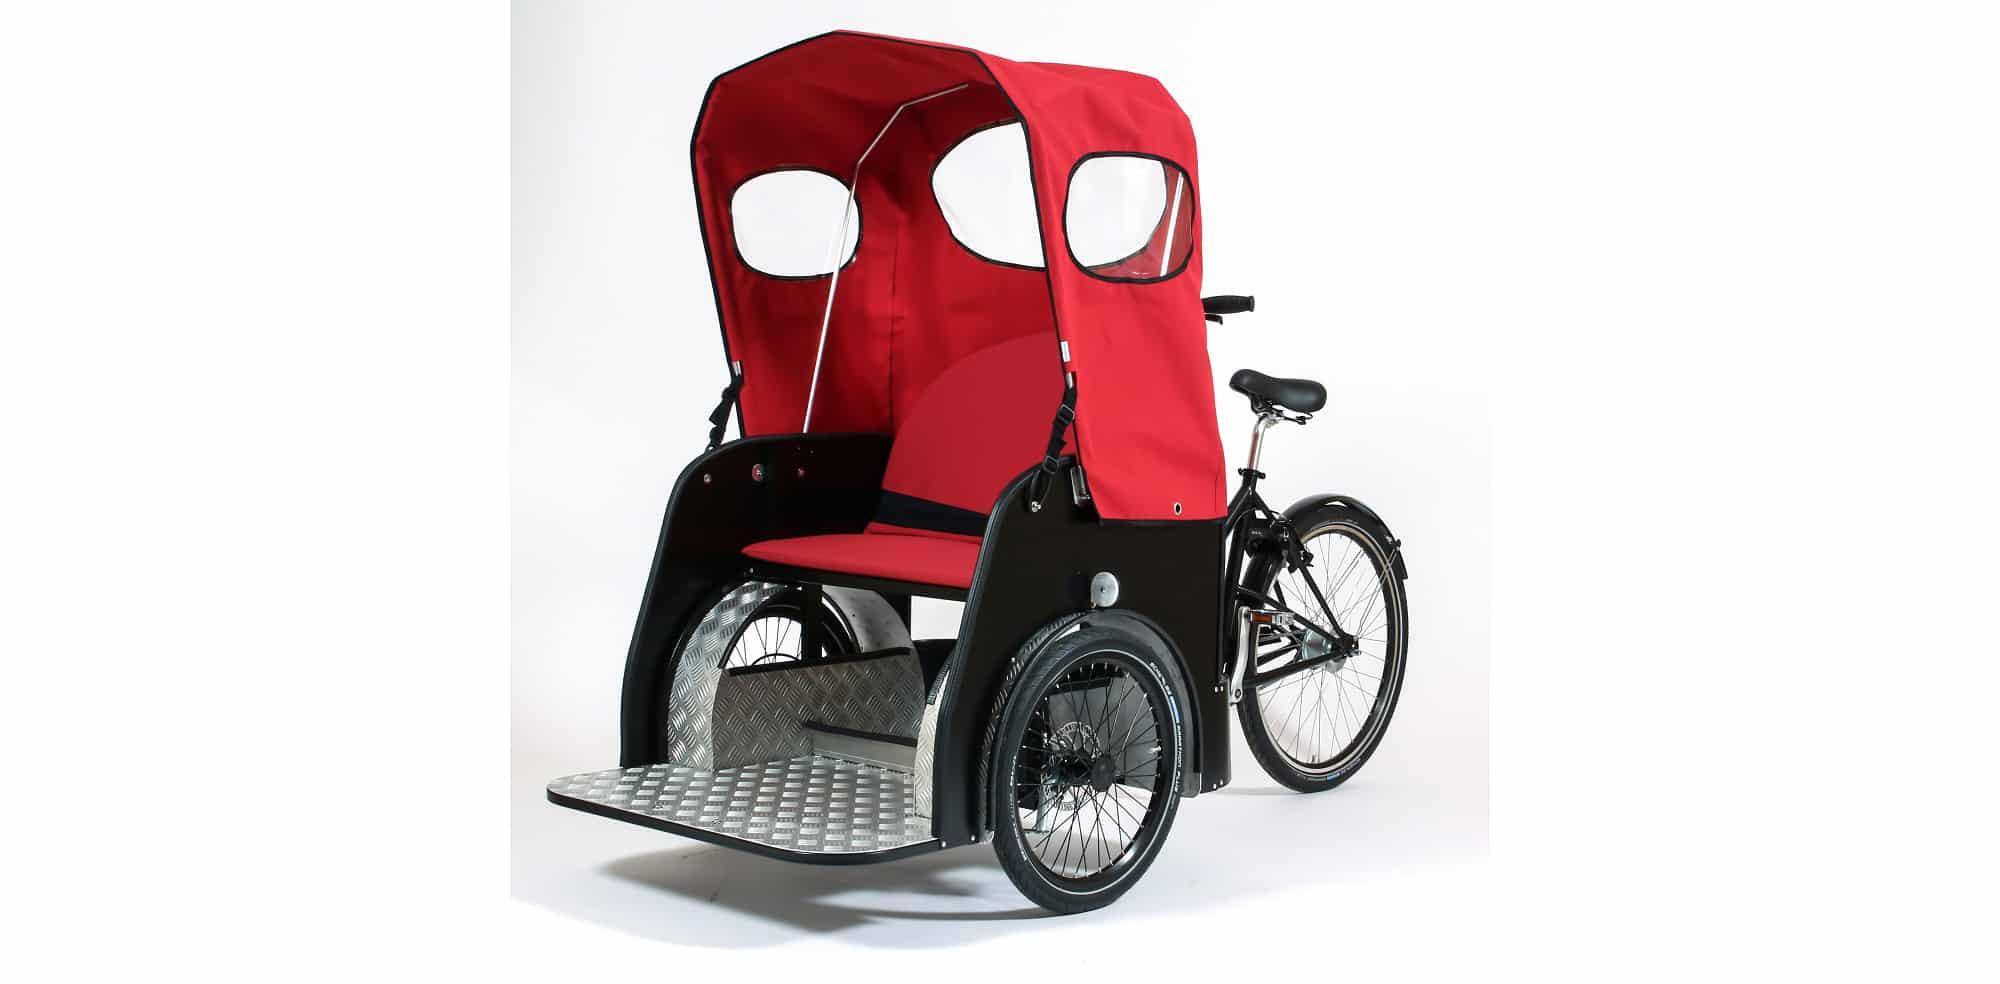 Nihola Taxi Rickshaw CWA Disabled Bike Special Needs Passenger Bike